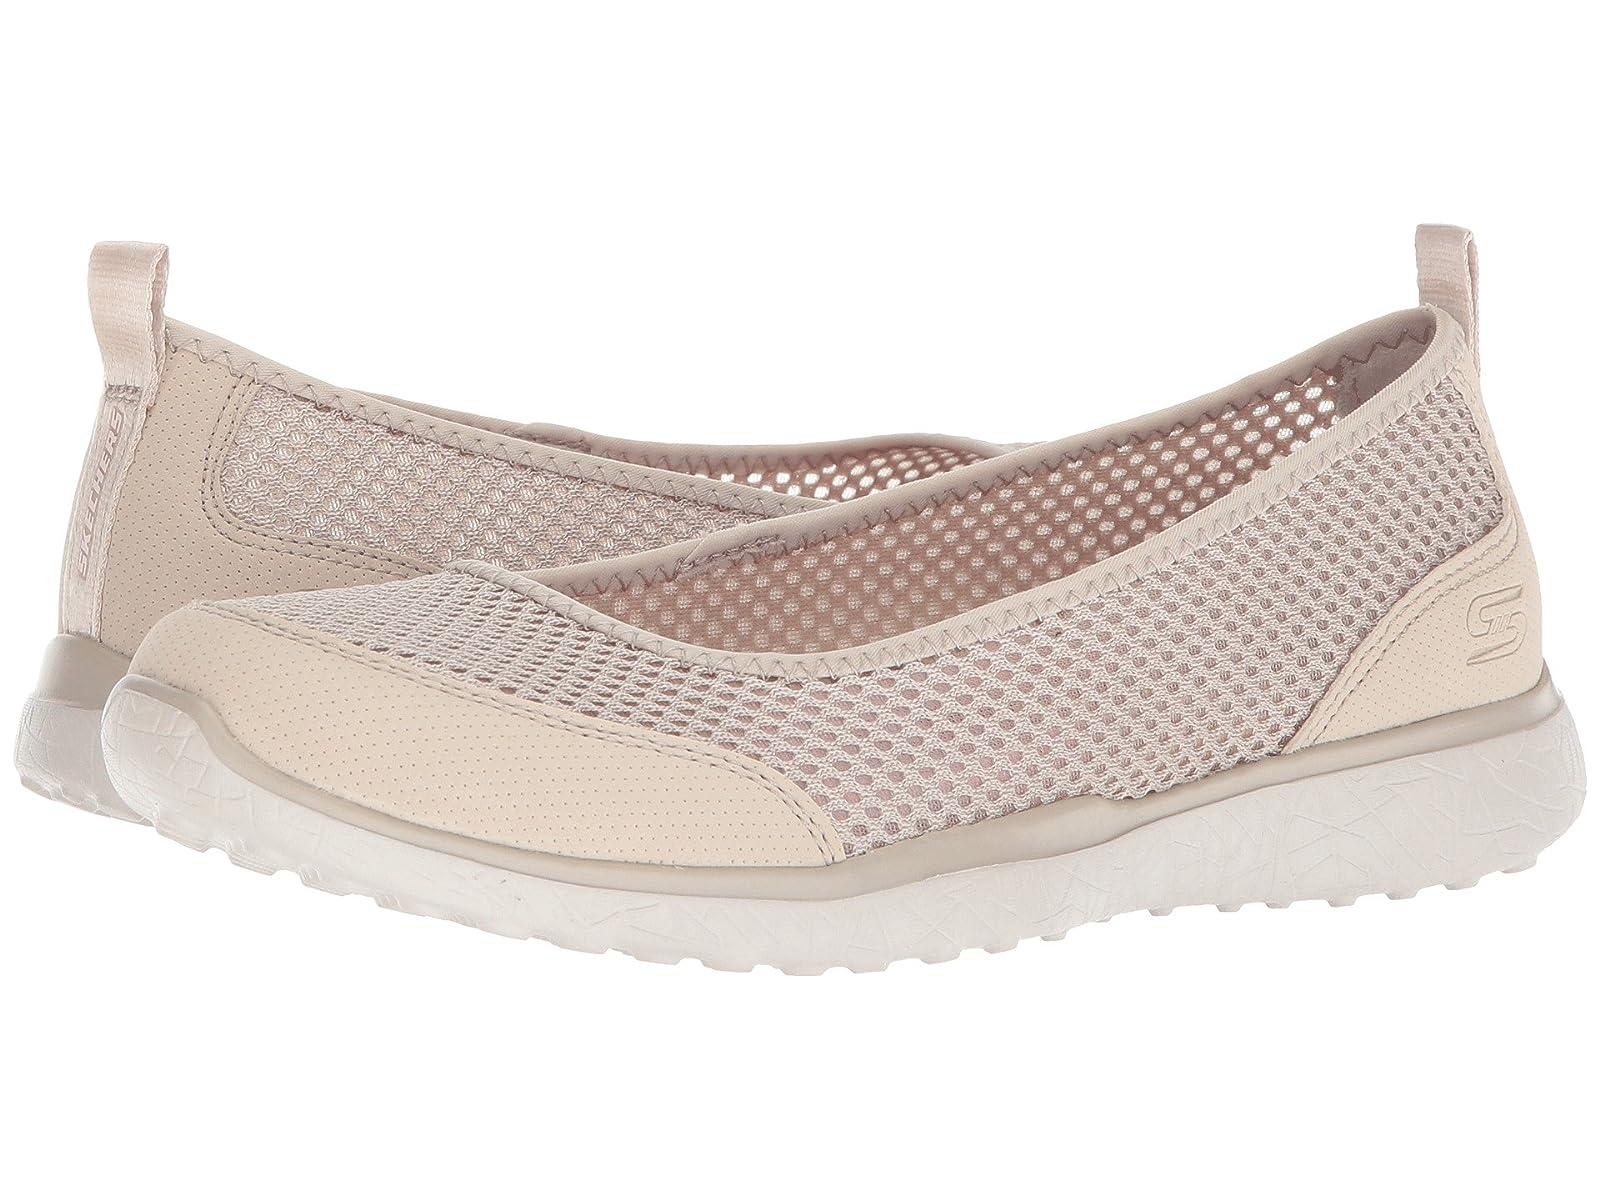 SKECHERS Microburst Sudden LookAtmospheric grades have affordable shoes